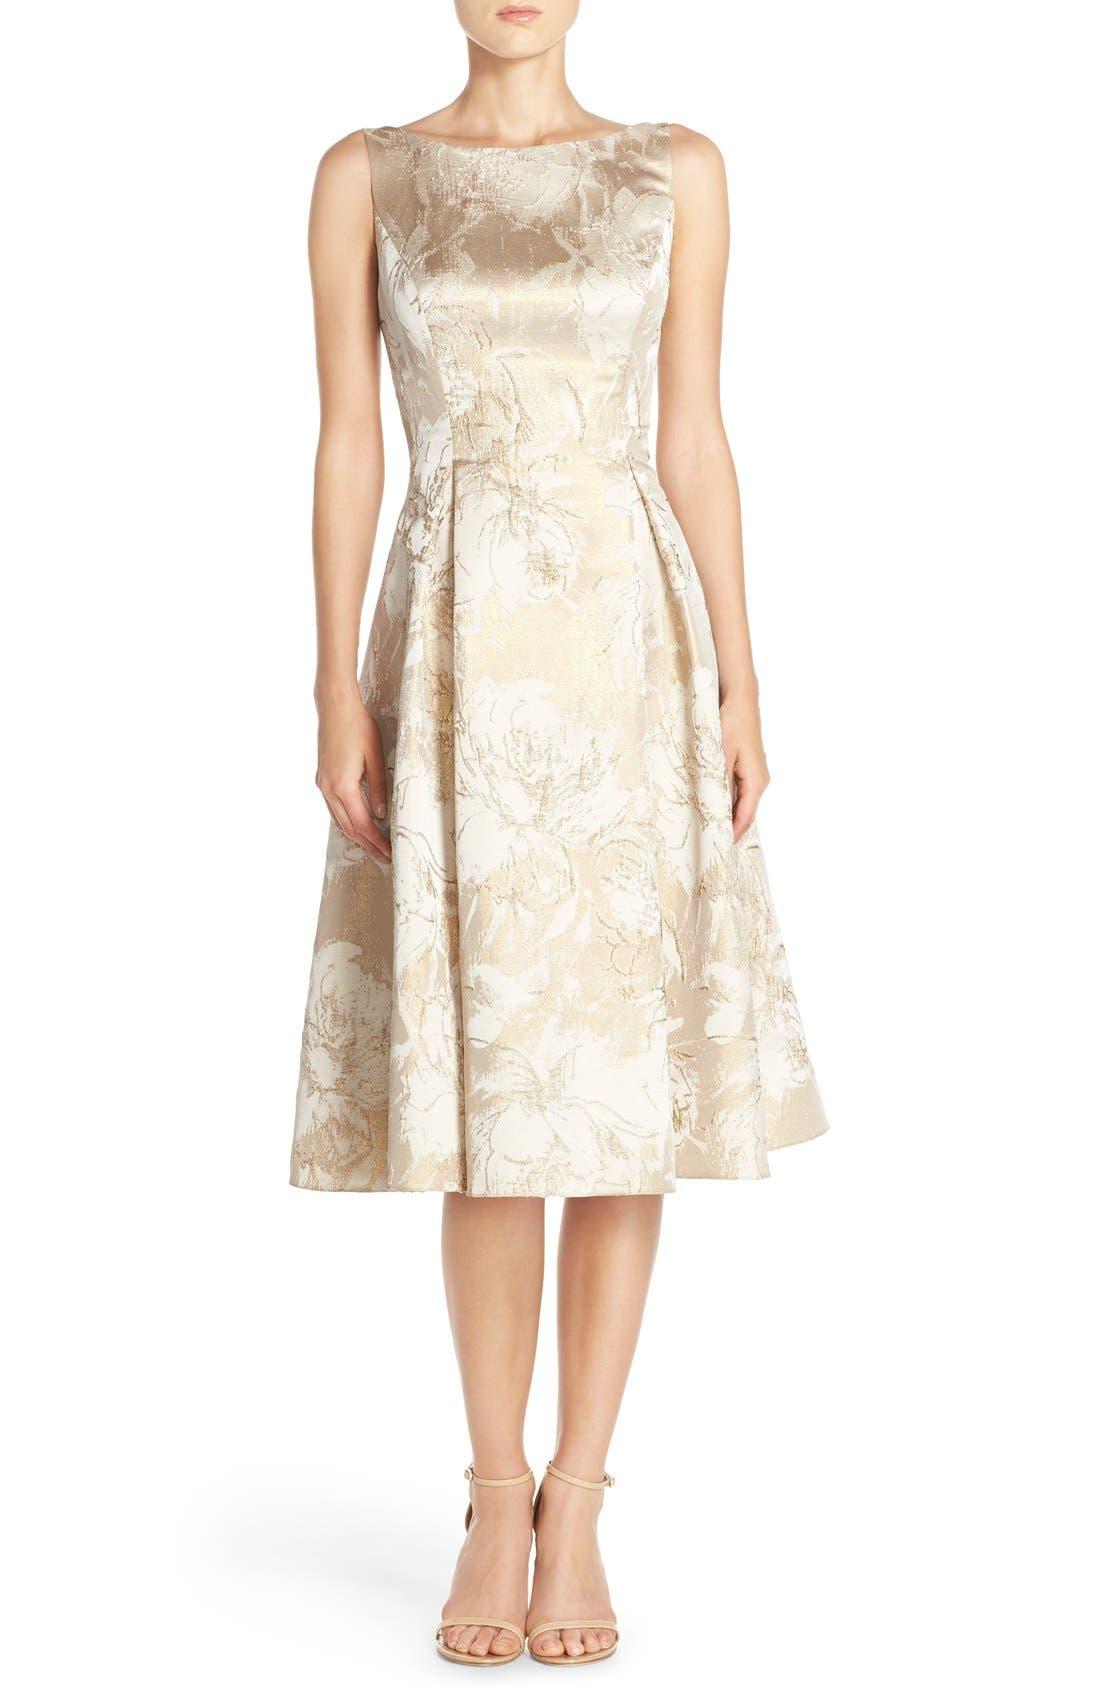 Alternate Image 1 Selected - Aidan Mattox Floral Metallic Jacquard Fit & Flare Dress